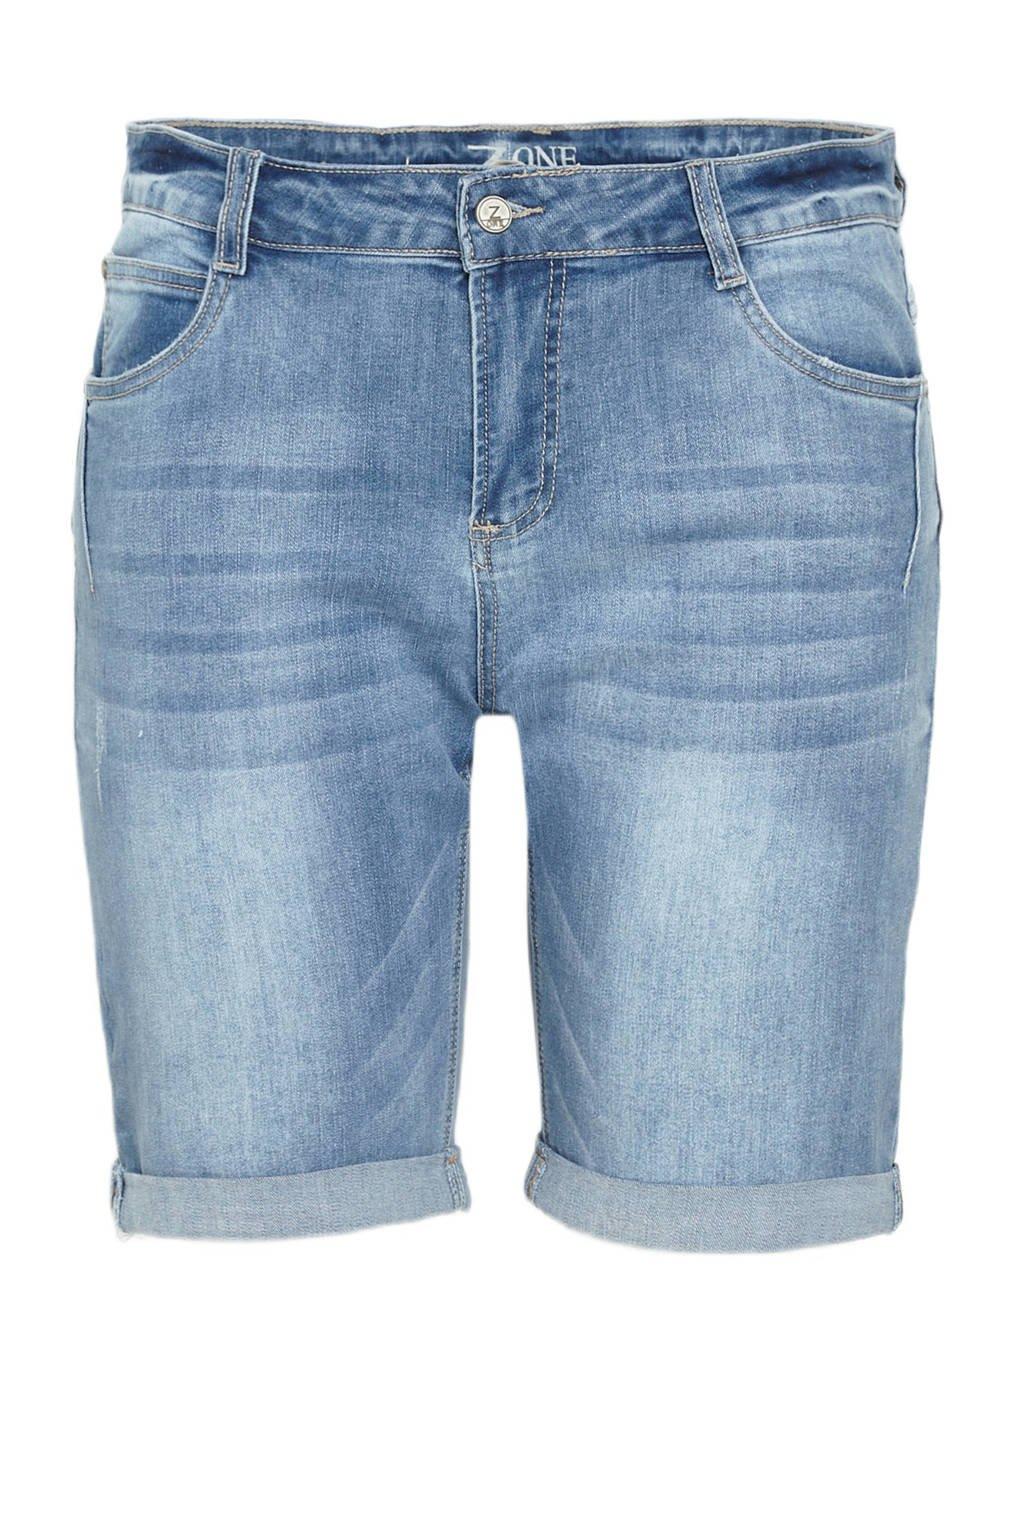 z-one bermuda jeans Pamela light denim, Light denim